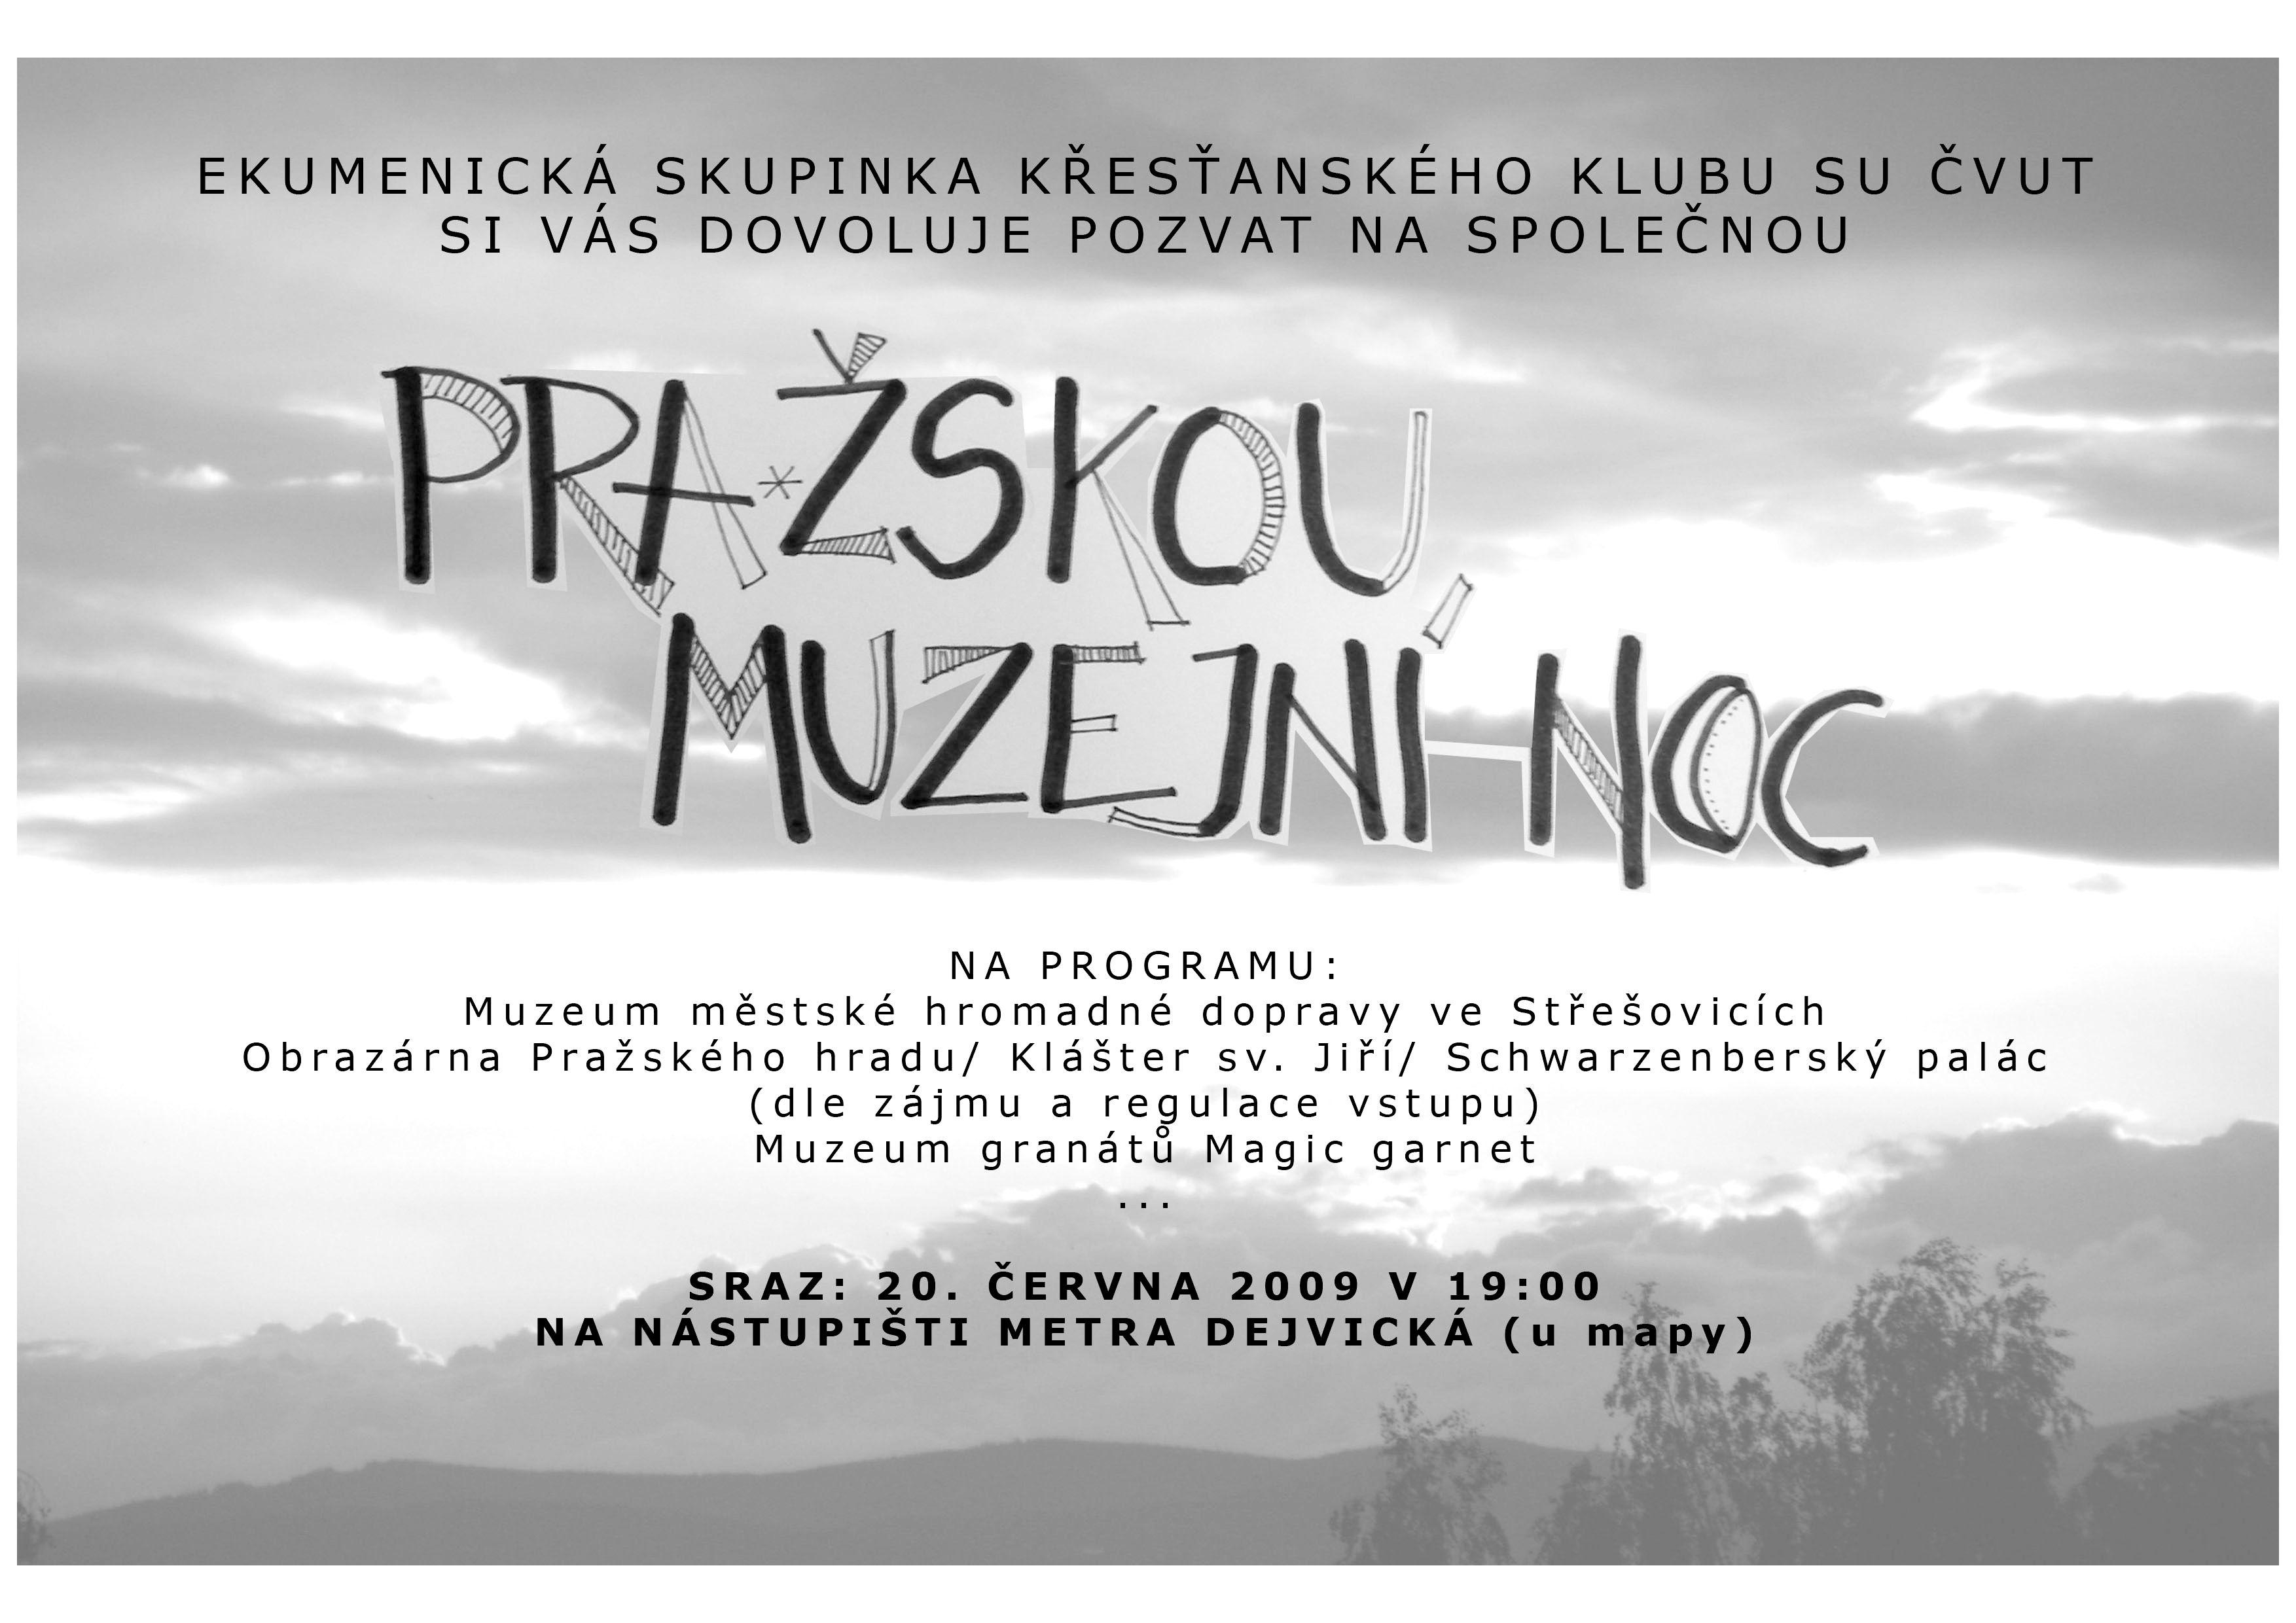 plakat_muzejni_noc_2062009